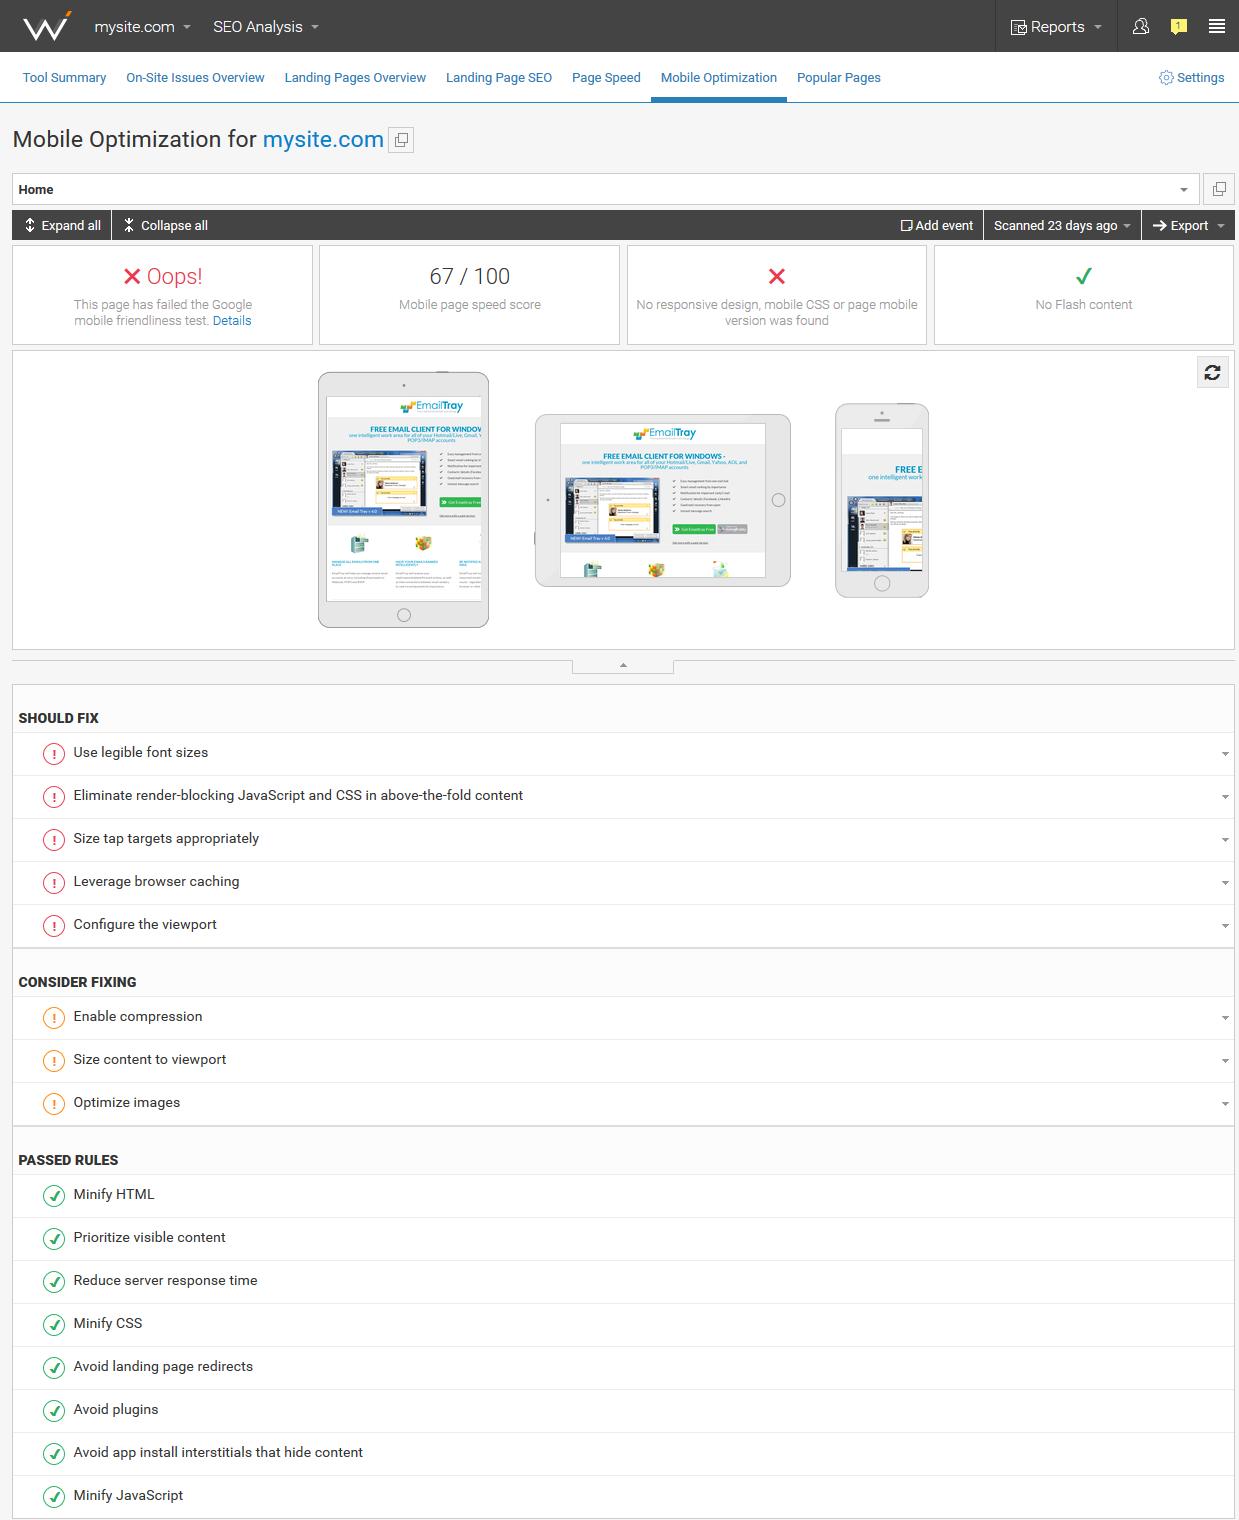 Web CEO Demo - SEO Analysis tool > Mobile Optimization report